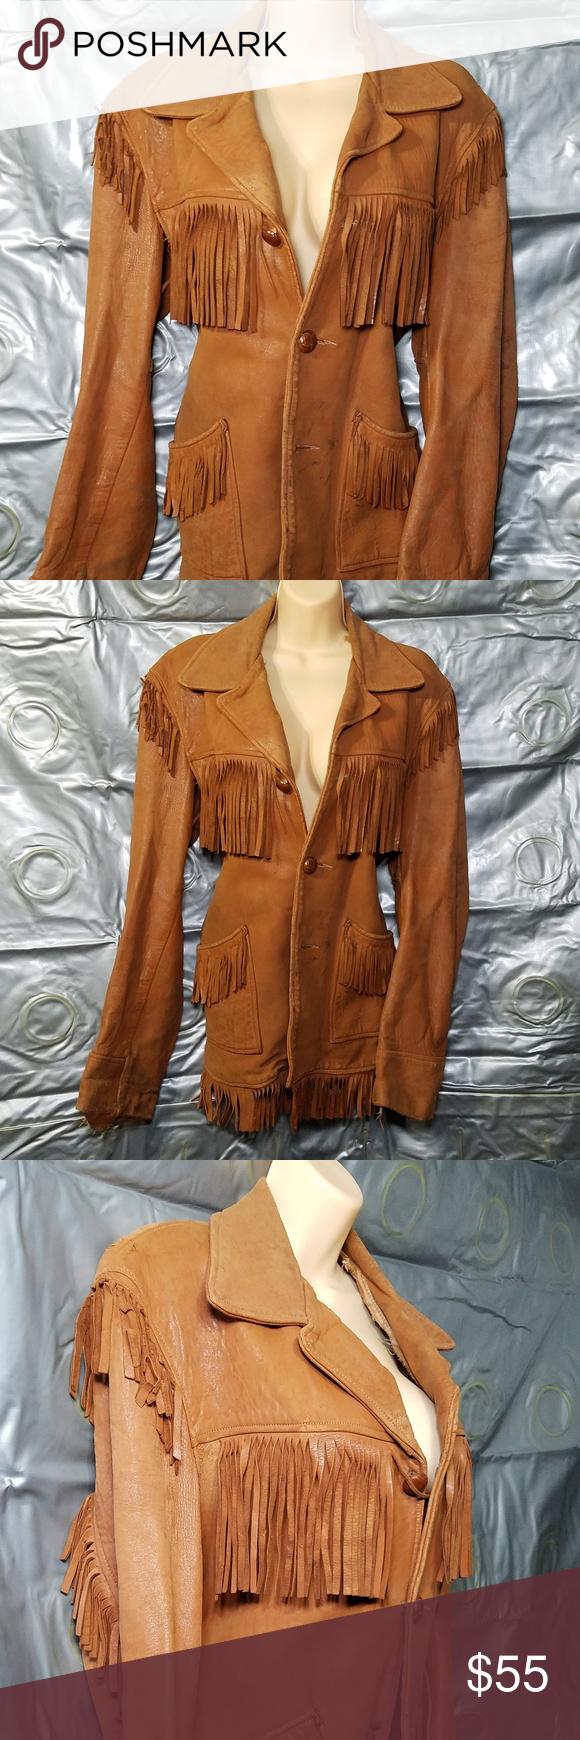 vintage genuine leather jacket w tassles Original